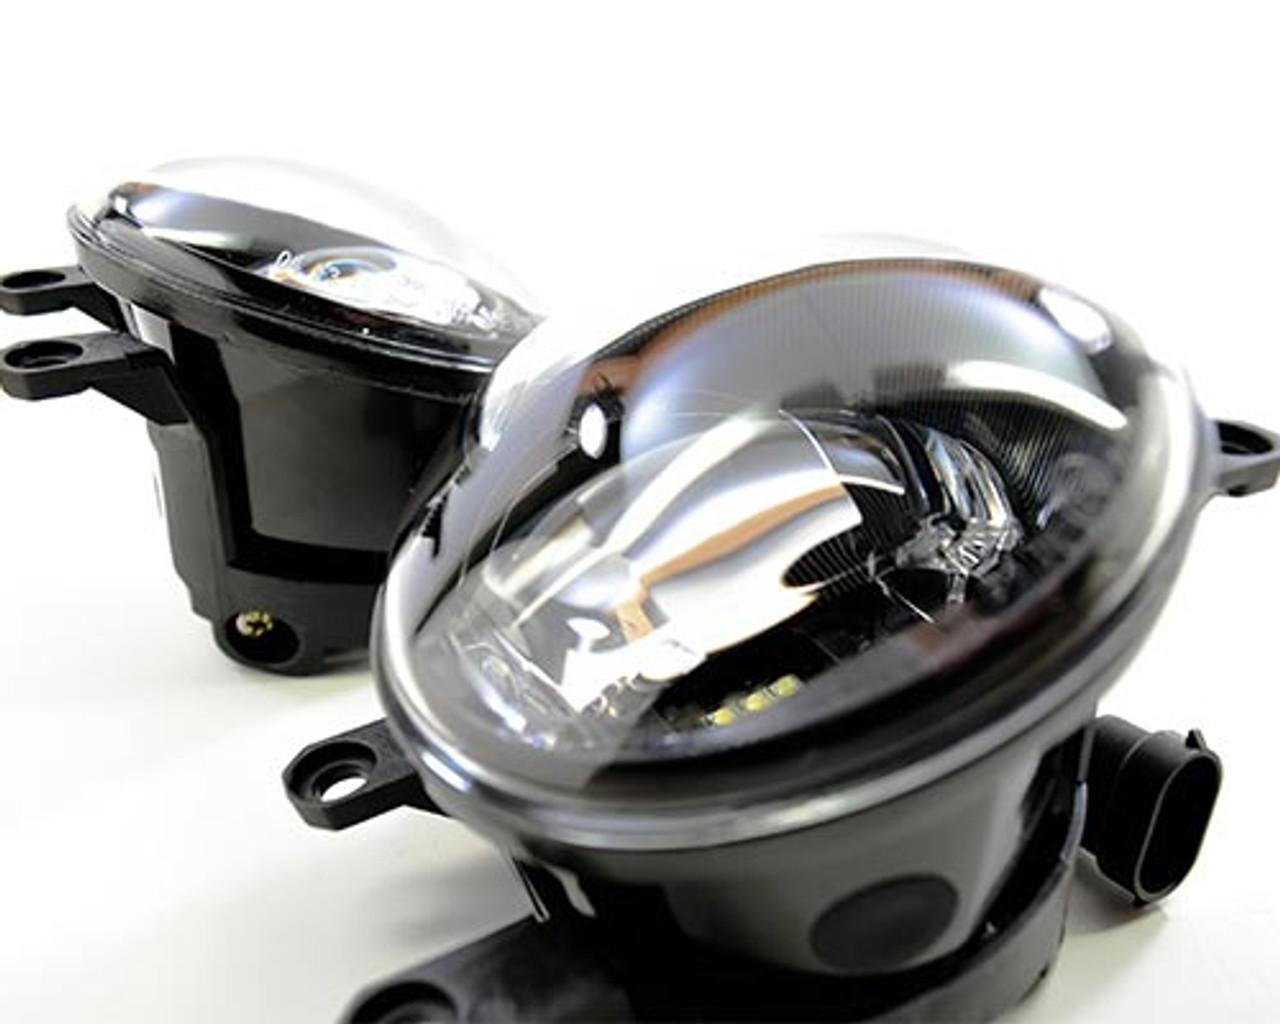 Toyota Morimoto LED Projector Fog Lights (Multiple Vehicles)